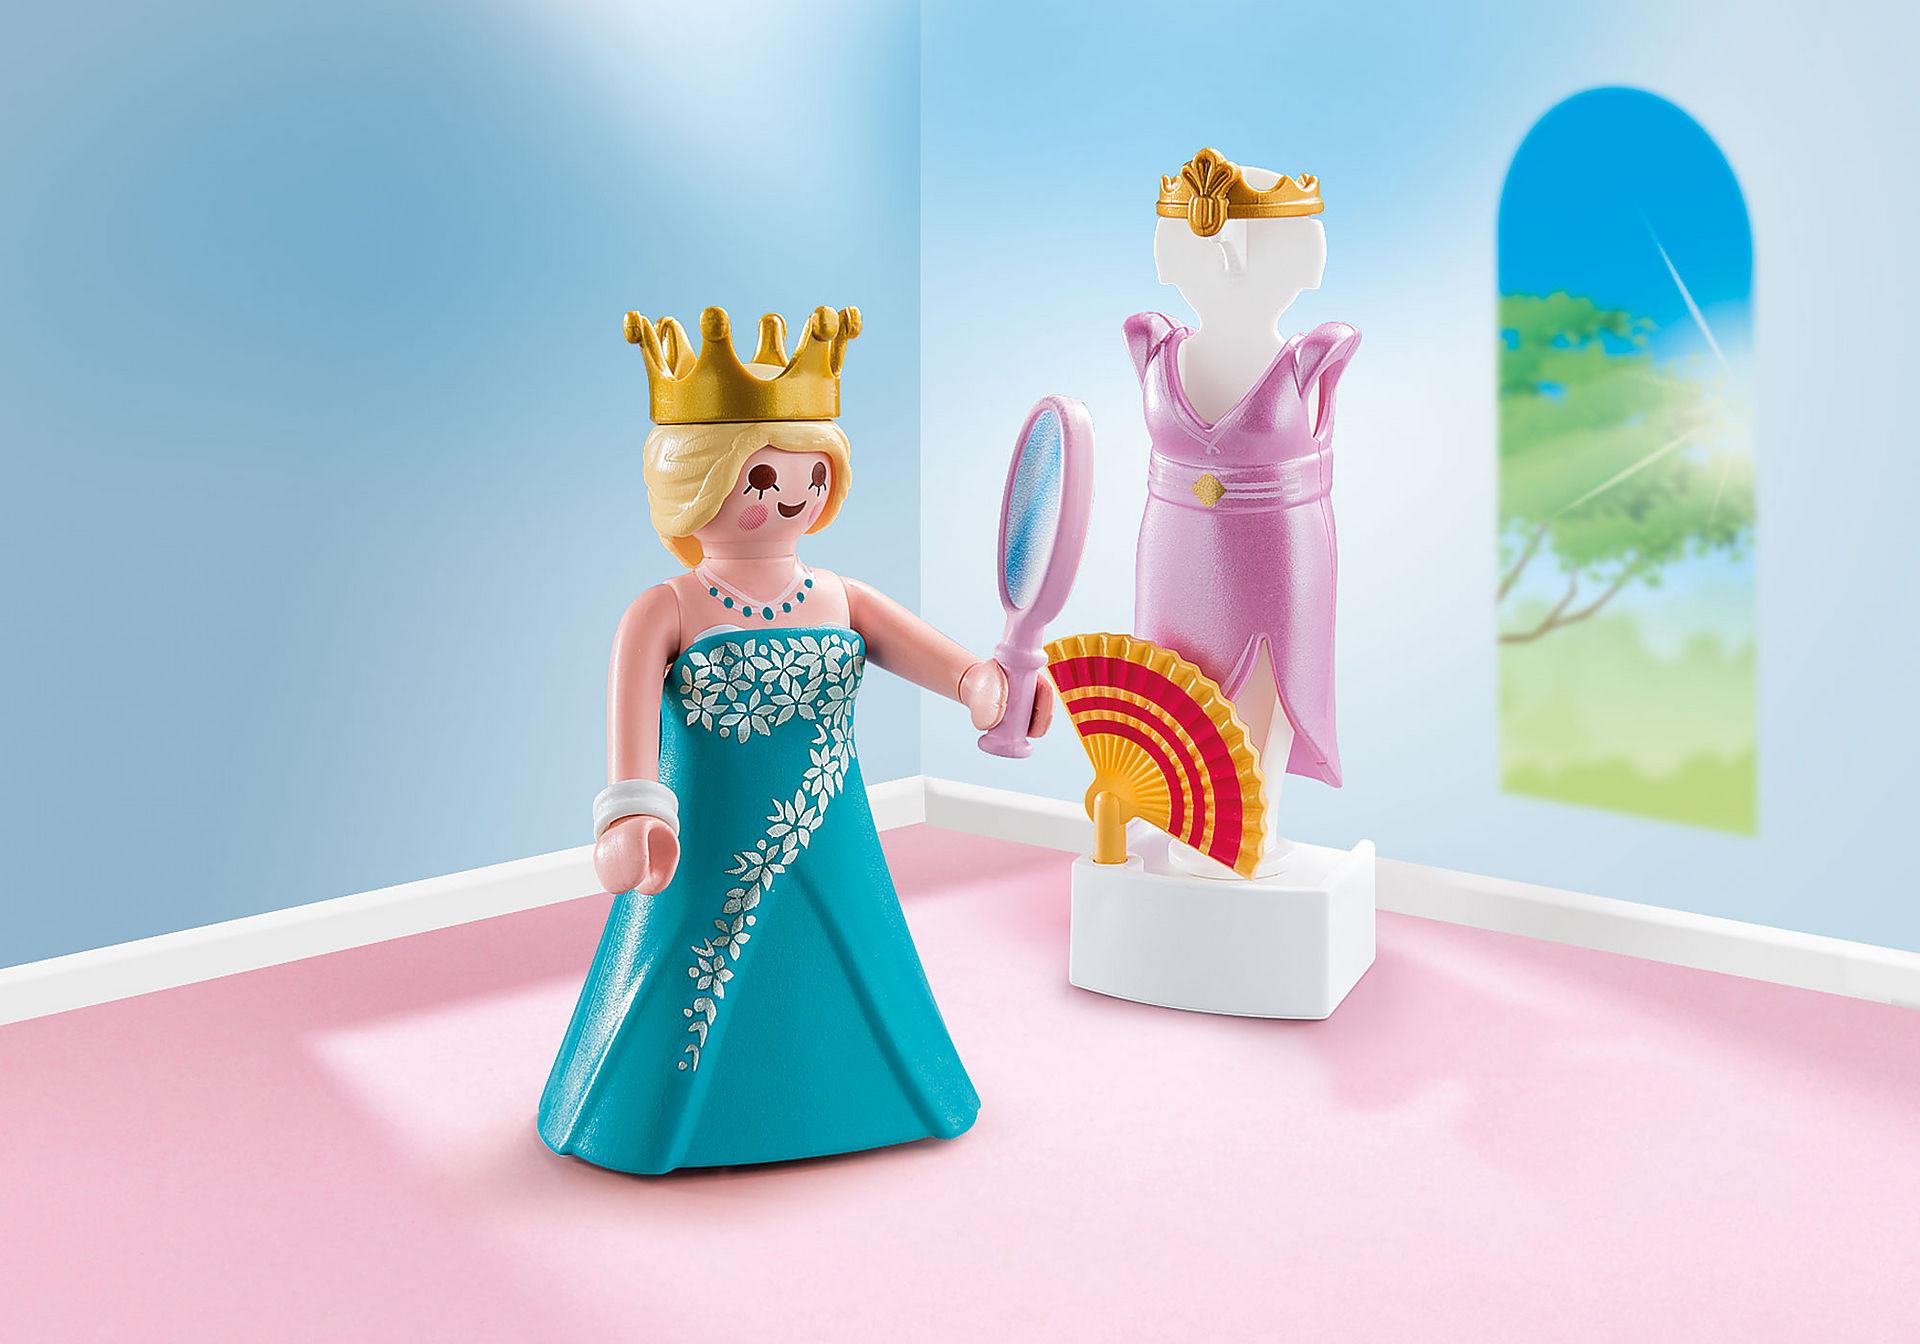 70153 Prinsessa med mannekäng zoom image1